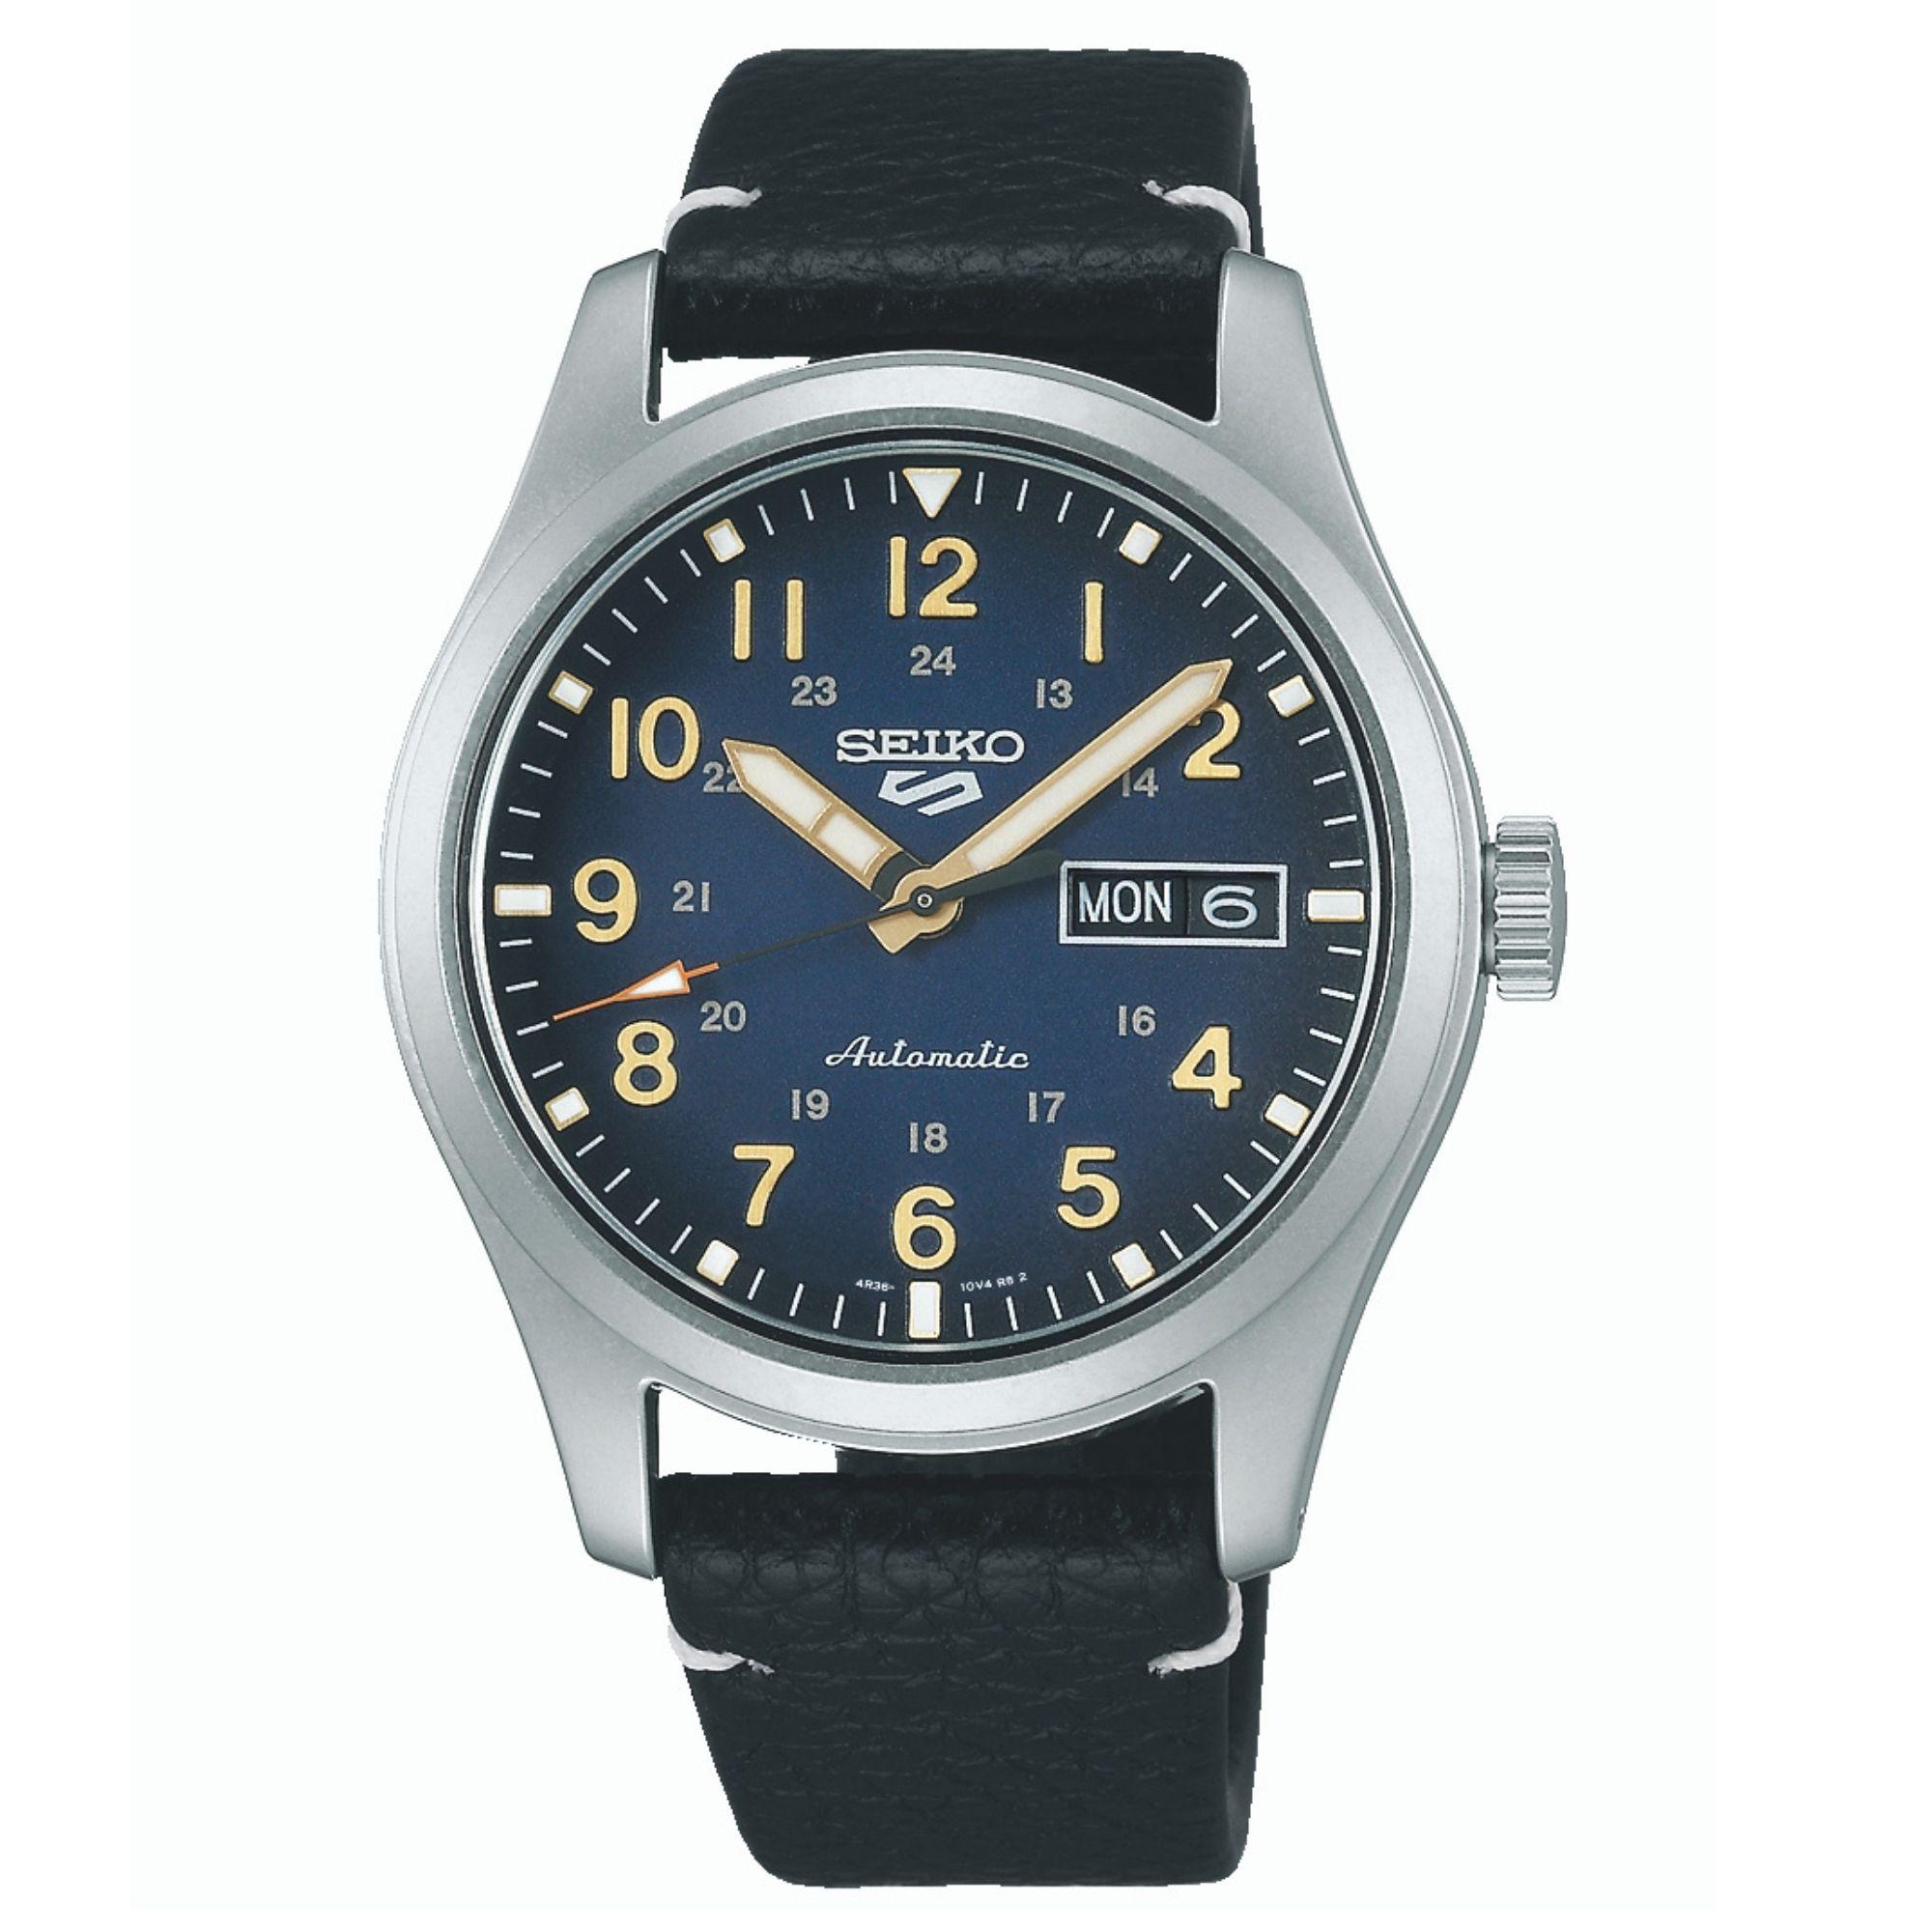 Seiko 5 Sports Automatic Movement Blue Dial Leather Bracelet Men's Watch SRPG39K1